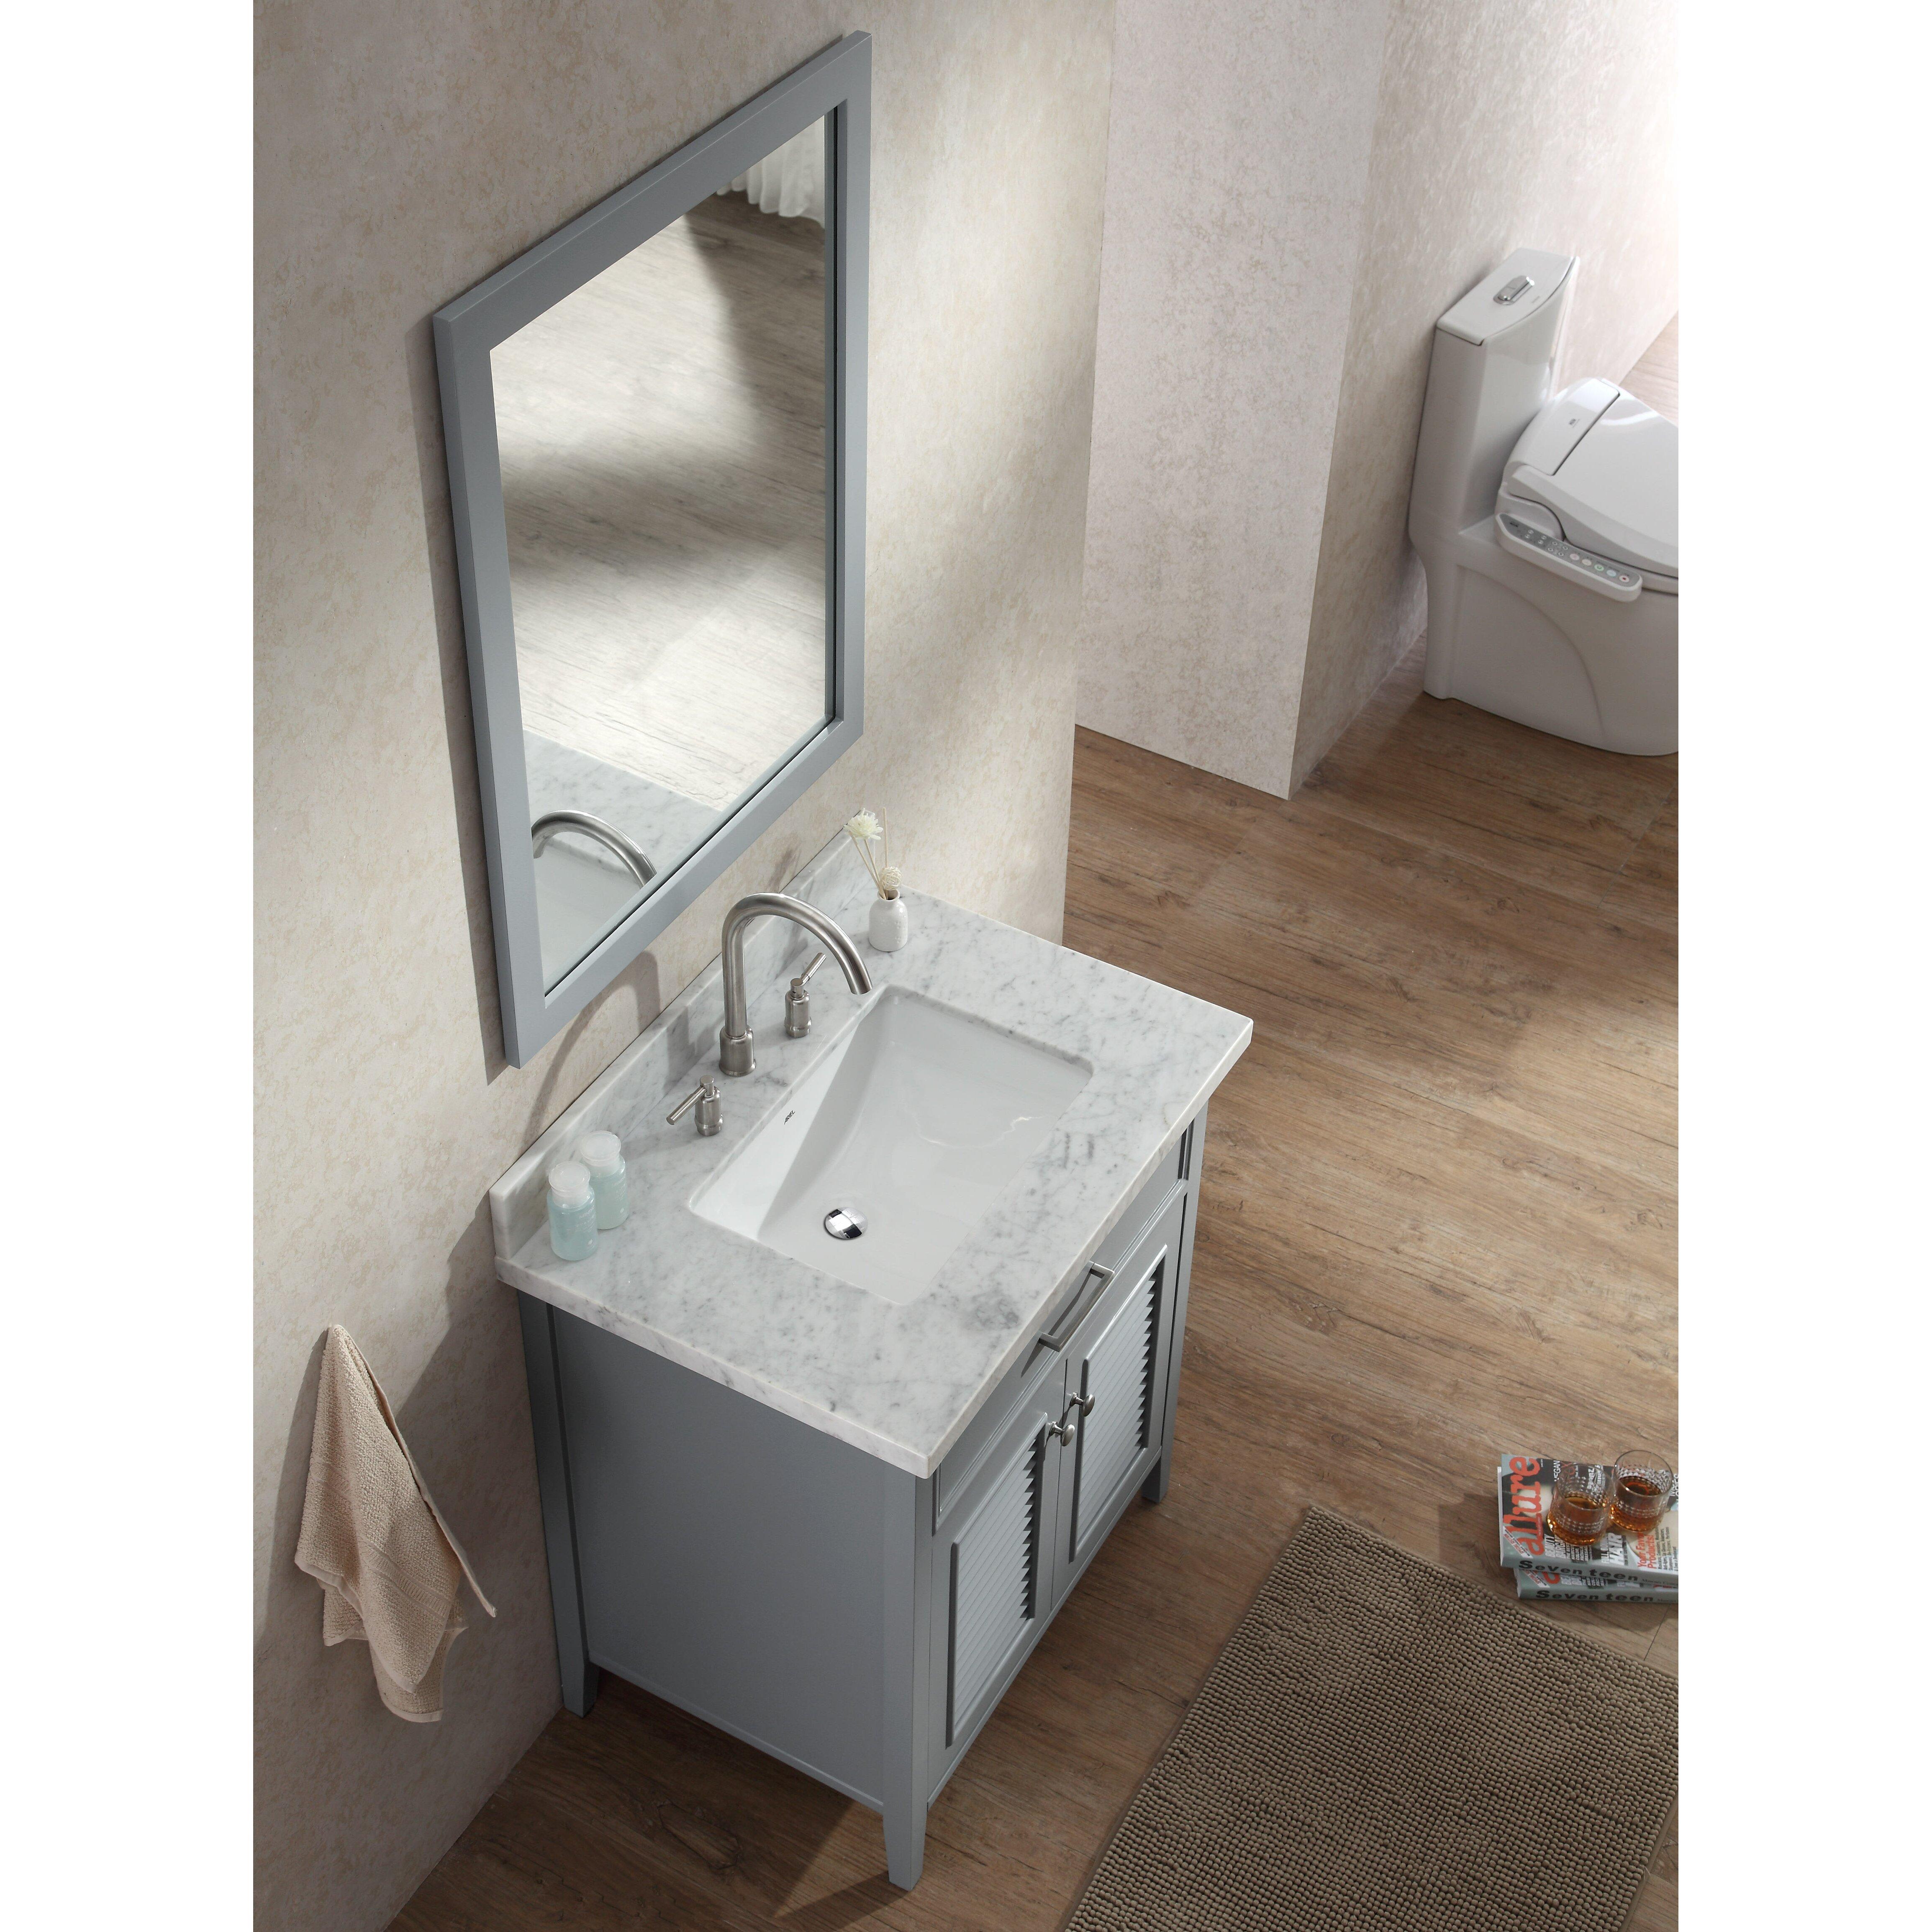 Breakwater Bay Brewster 31 amp quot  Single Bathroom Vanity Set with Mirror. Breakwater Bay Brewster 31 quot  Single Bathroom Vanity Set with Mirror